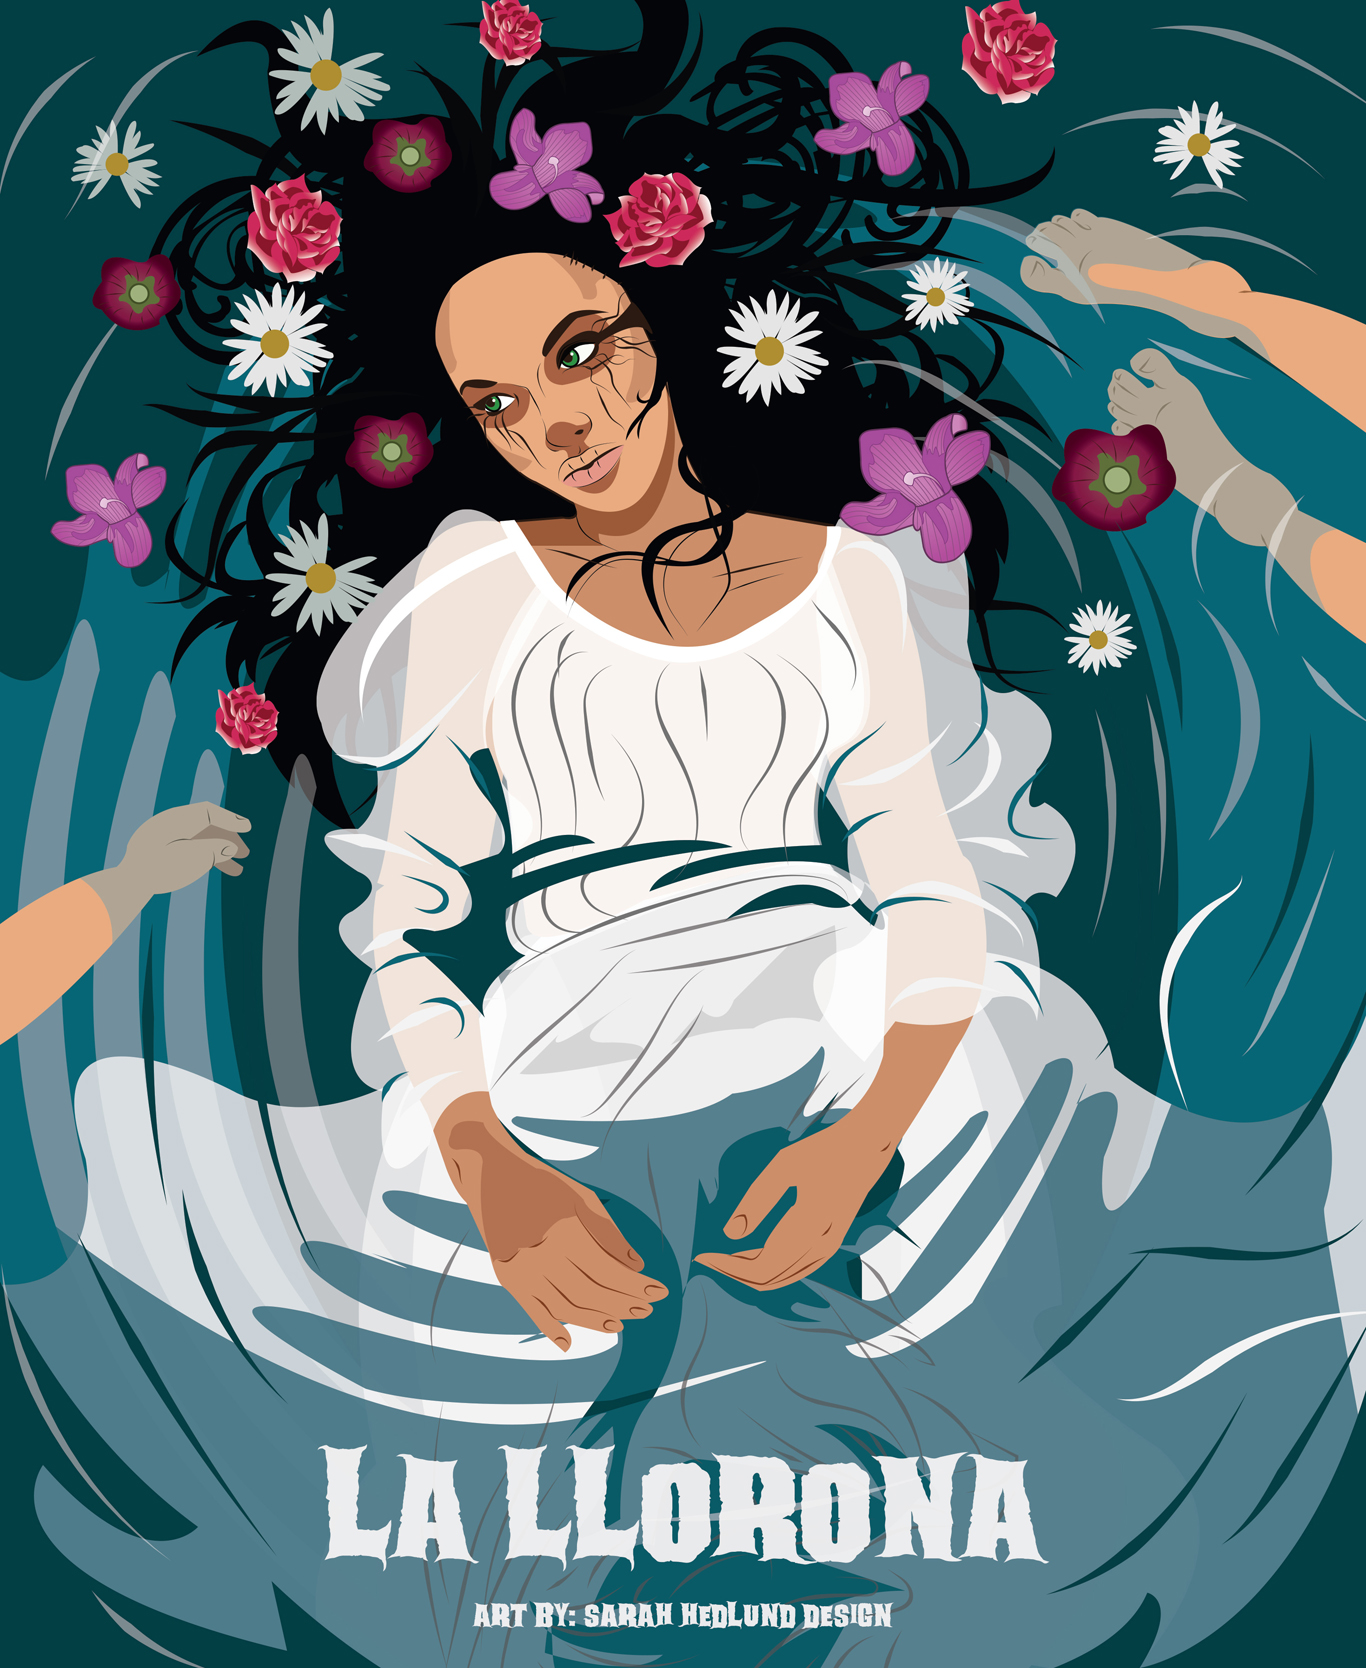 La Llorona, , urban legend © Sarah Hedlund Design